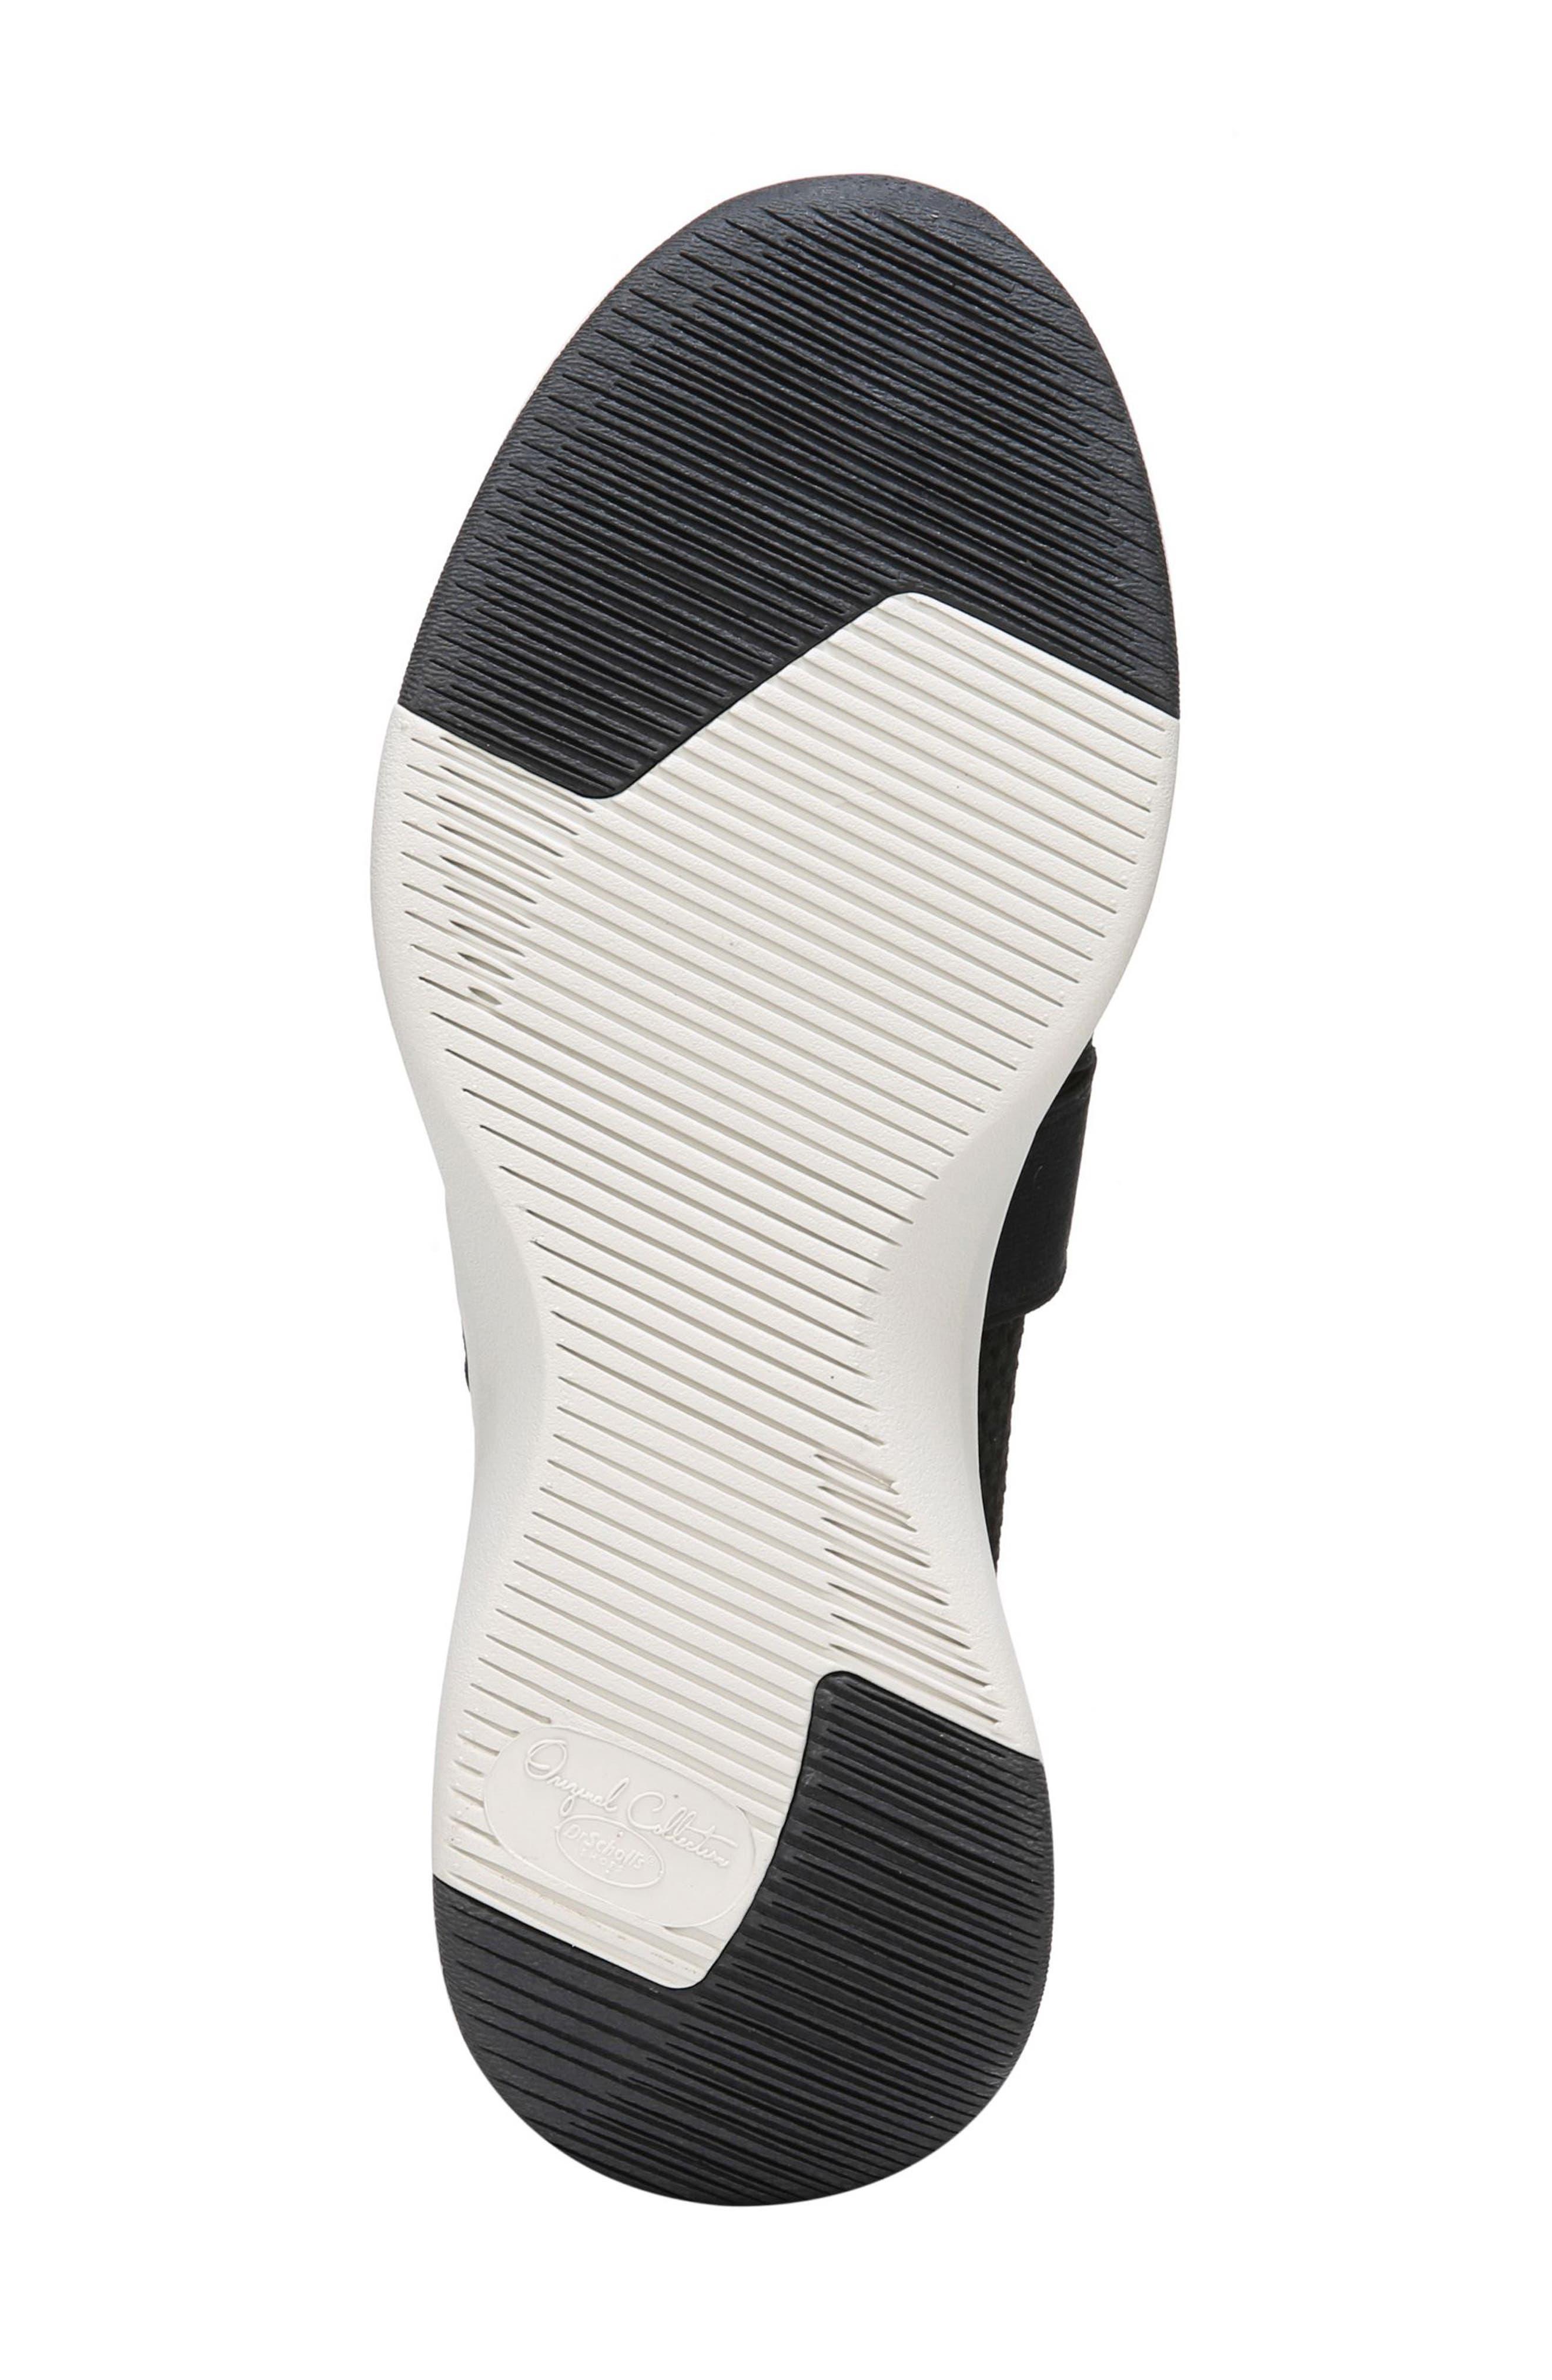 Slay All Day Sneaker,                             Alternate thumbnail 6, color,                             BLACK FABRIC